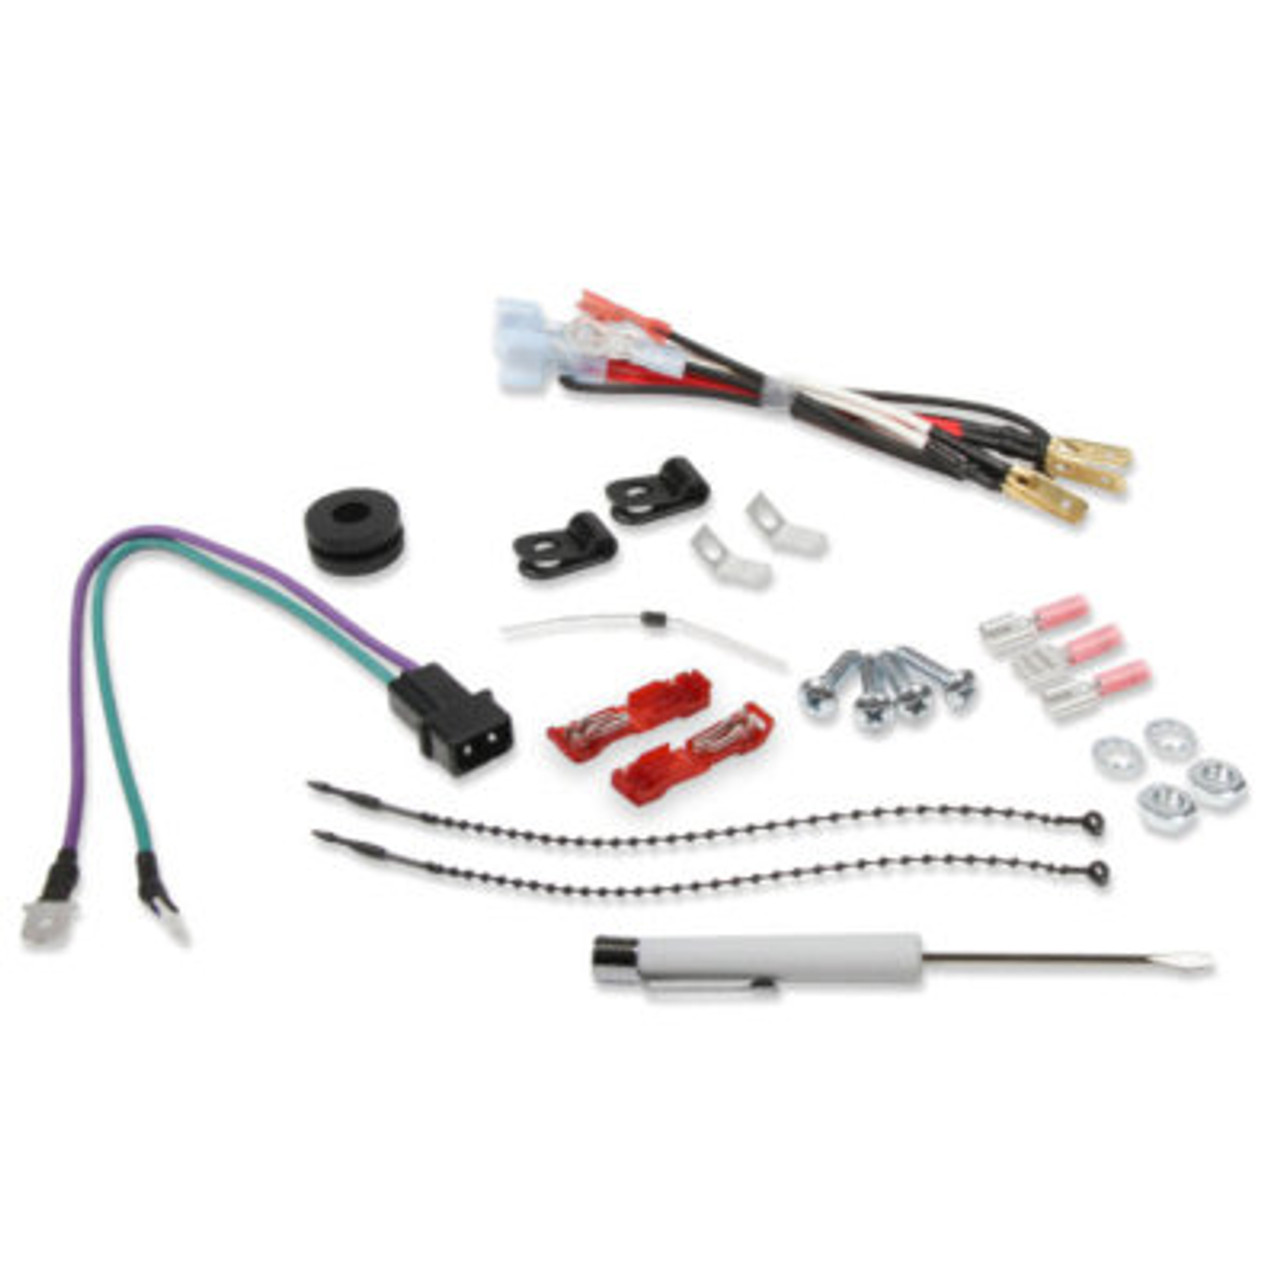 MSD6415, Ignition Box, Digital 6EFI, Digital, CD Ignition, Multi-Spark, 43000V, Rev Limiter, Each